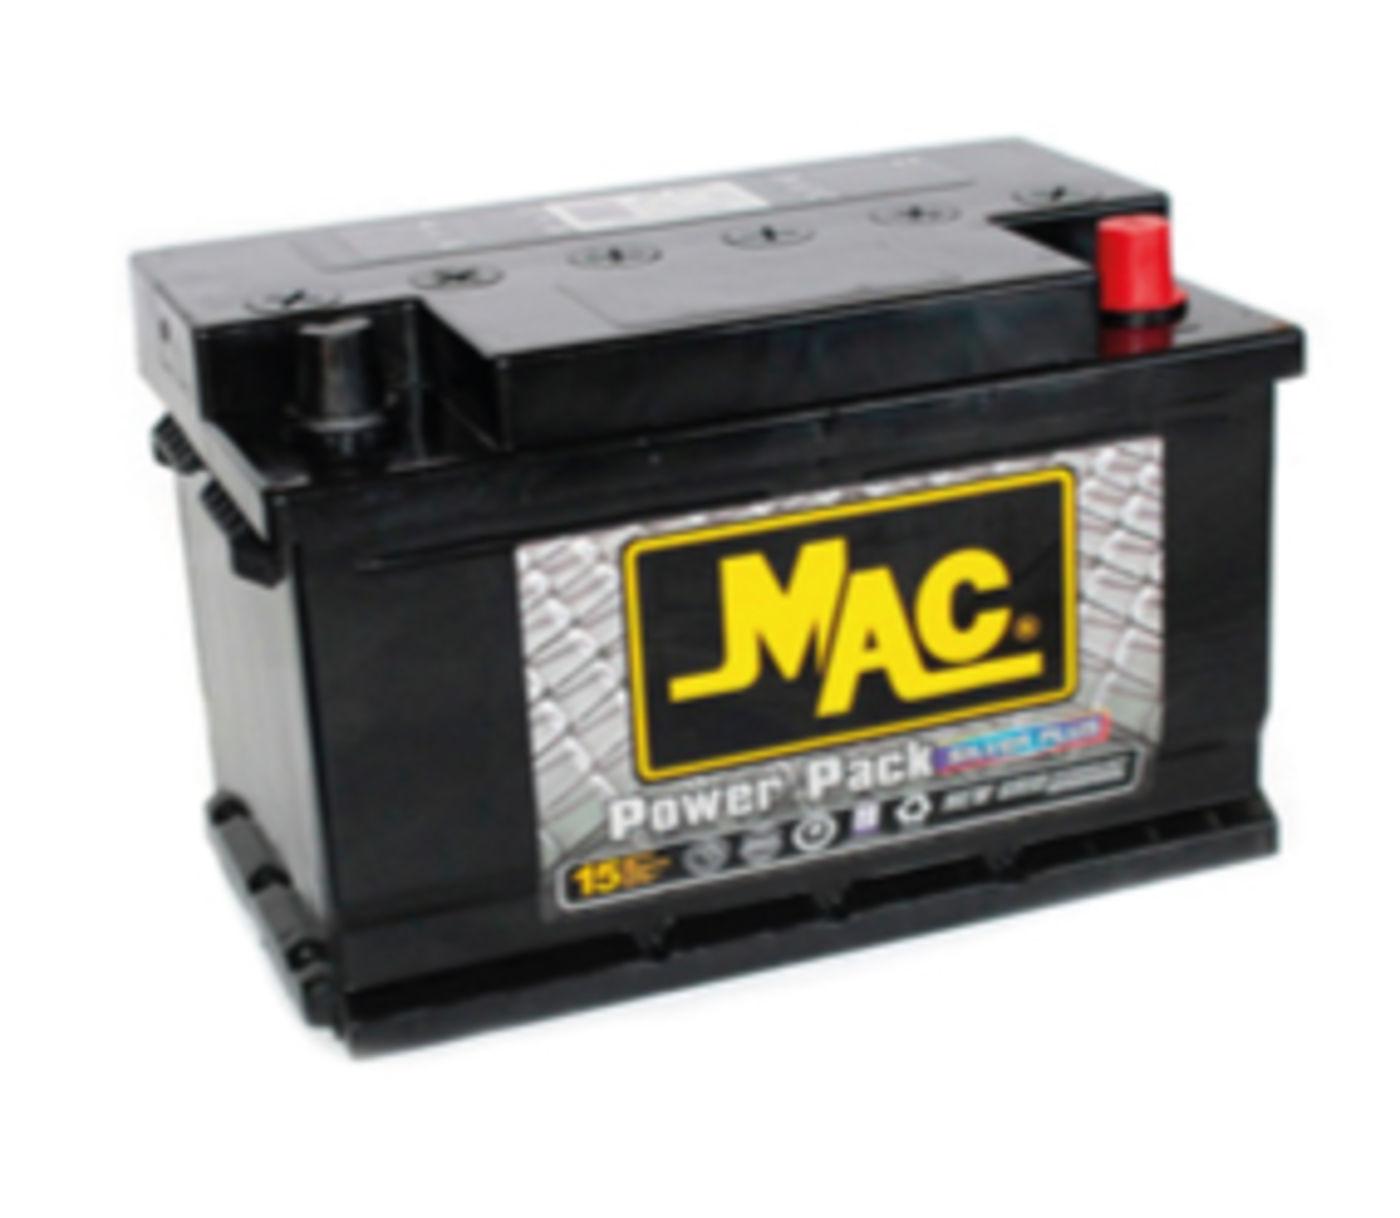 Mac 4DLT1200M